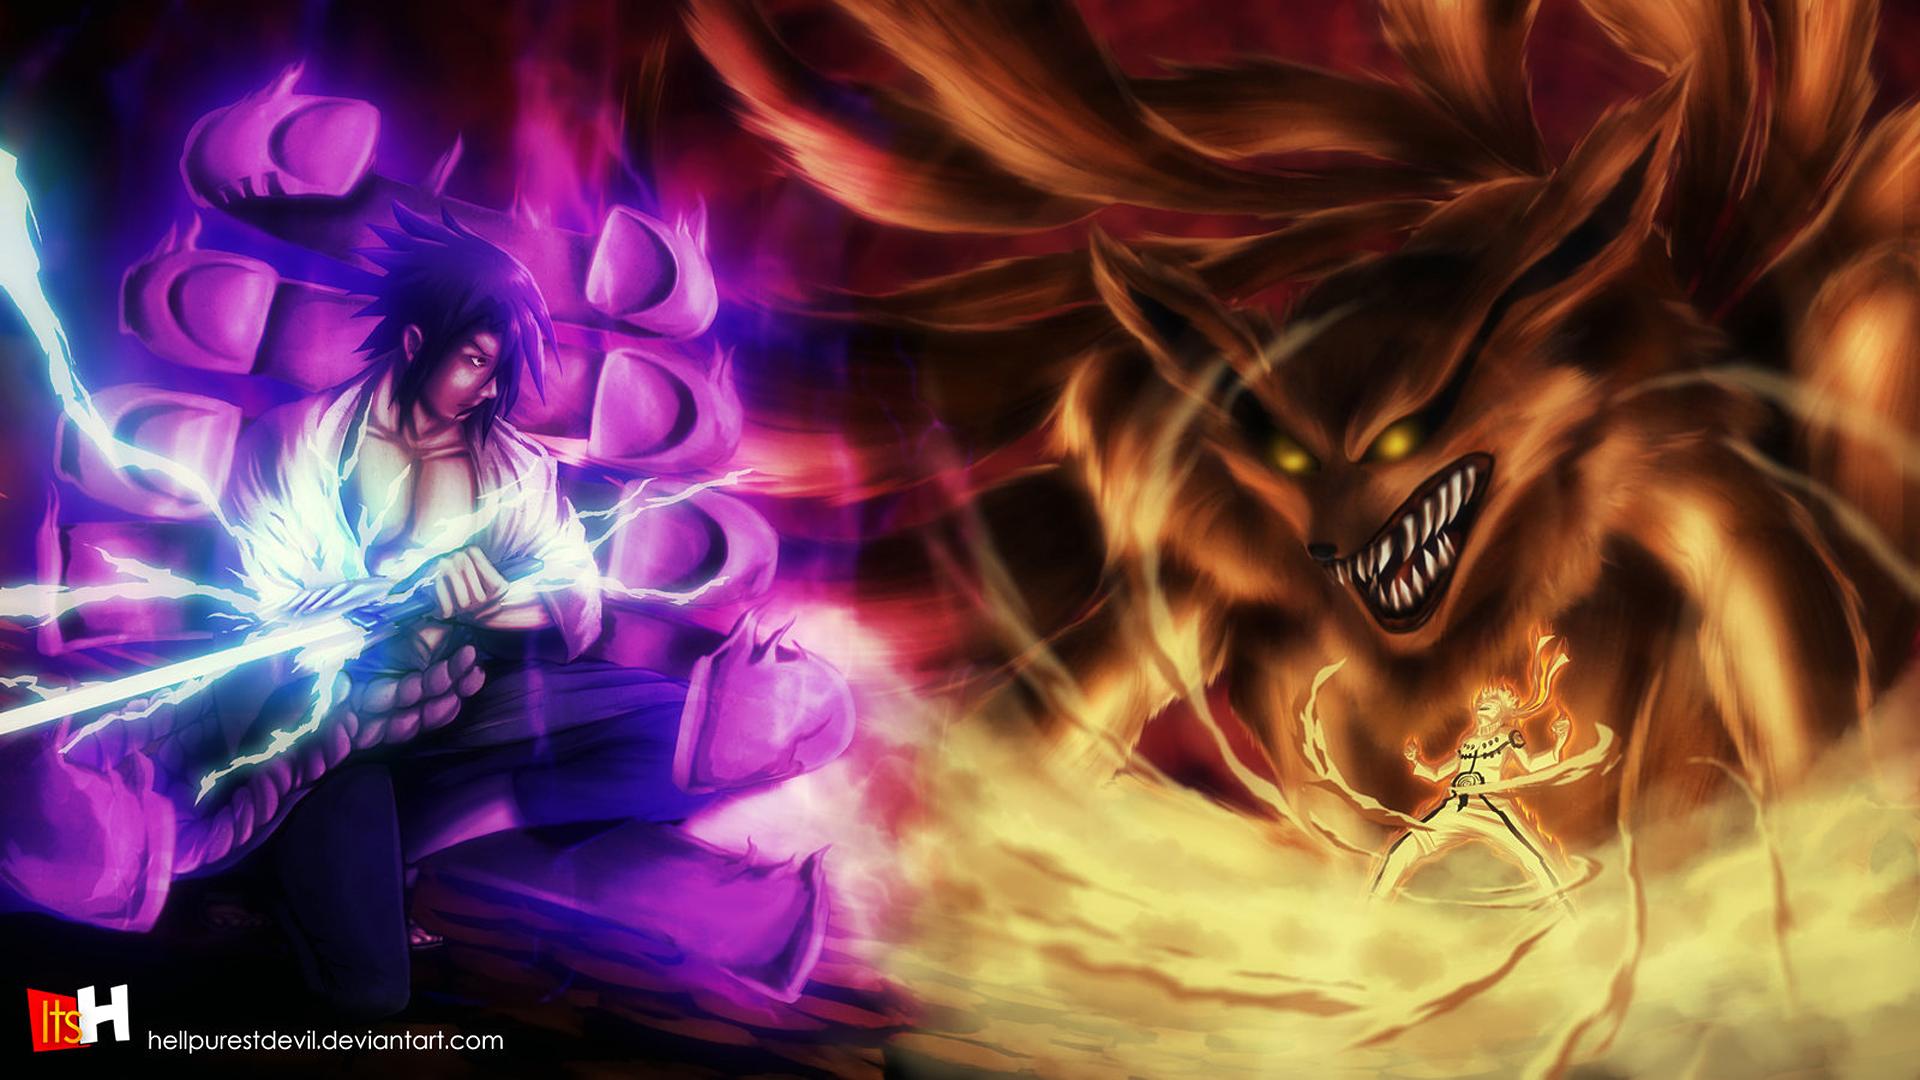 Simple Wallpaper Naruto Purple - sasuke-vs-naruto-hd-1920x1080  Trends_625220.jpg